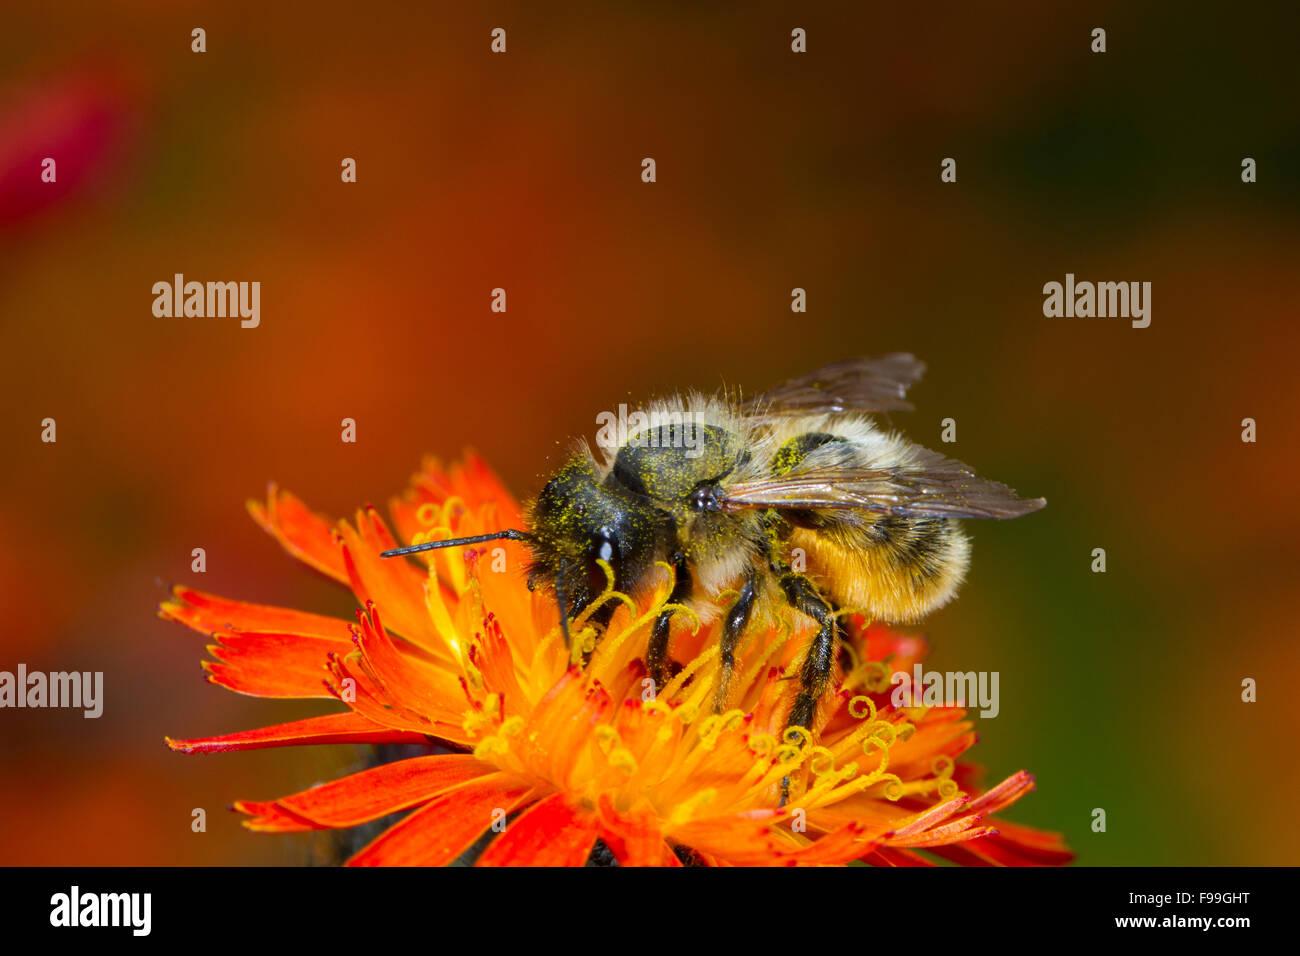 Red Mason Bee (Osmia bicornis) adult female feeding on Orange Hawkweed (Pilosella aurantiaca) flowers. Powys, Wales, - Stock Image